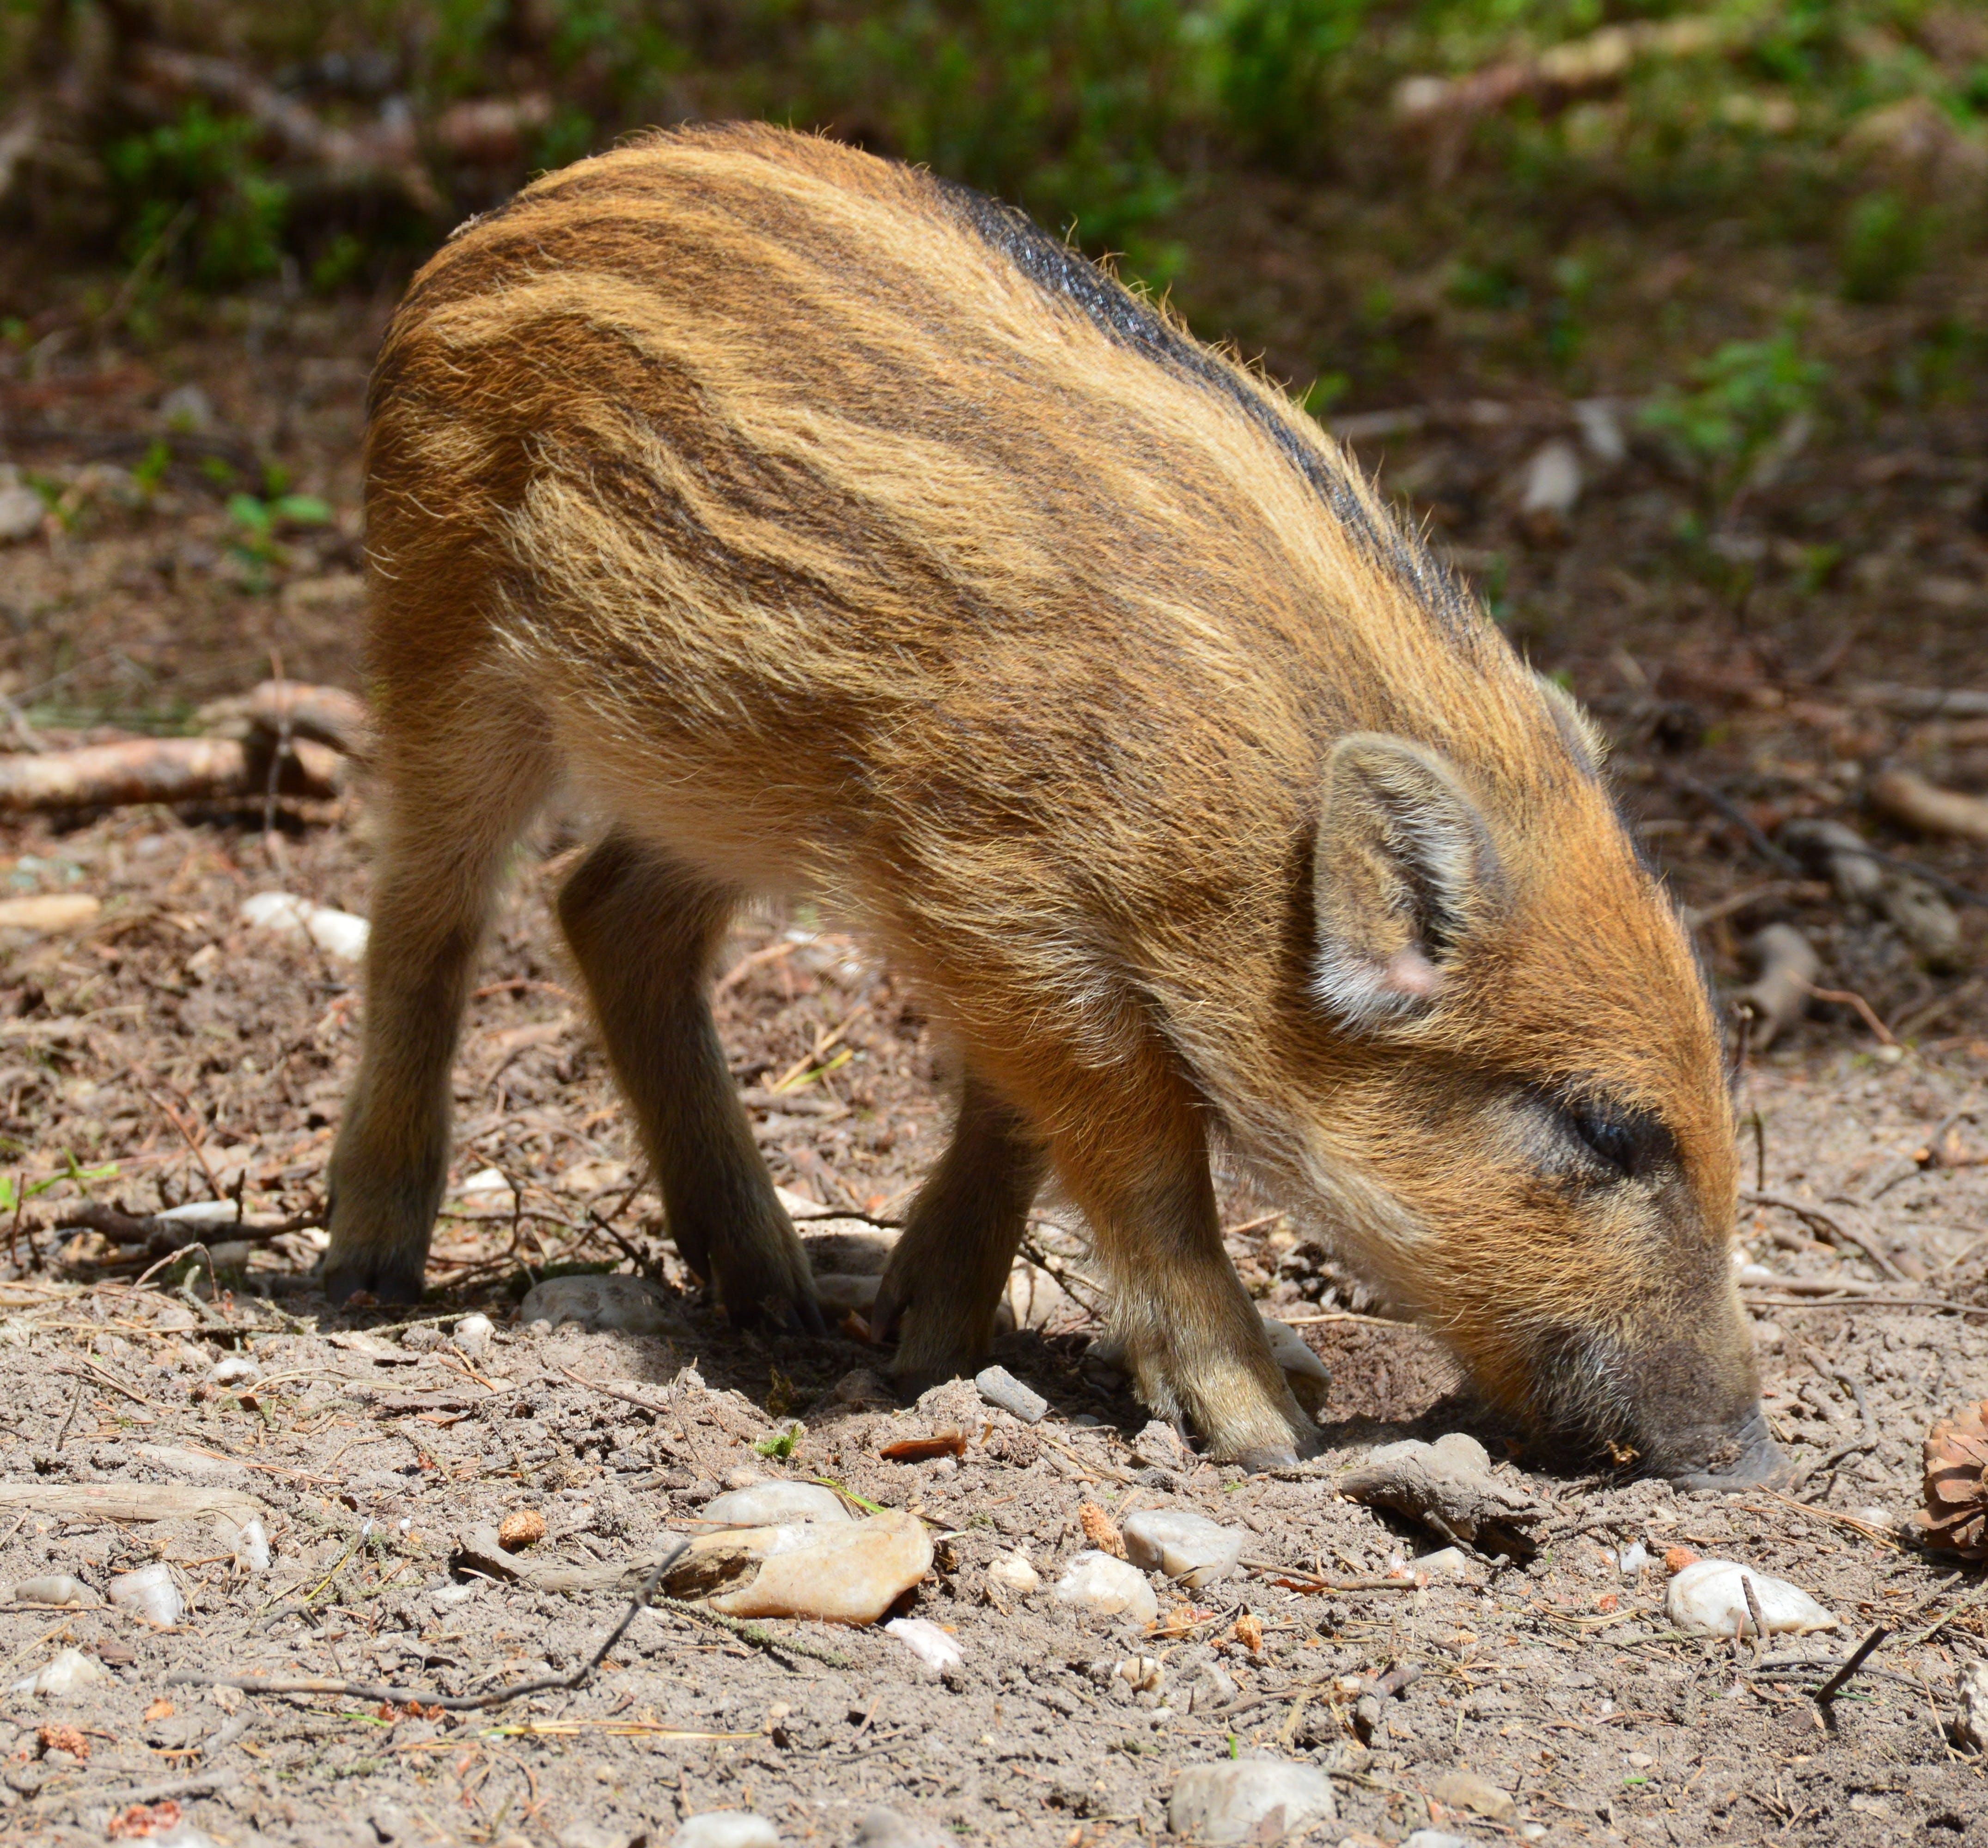 Free stock photo of animal, brood, cub, hog wild